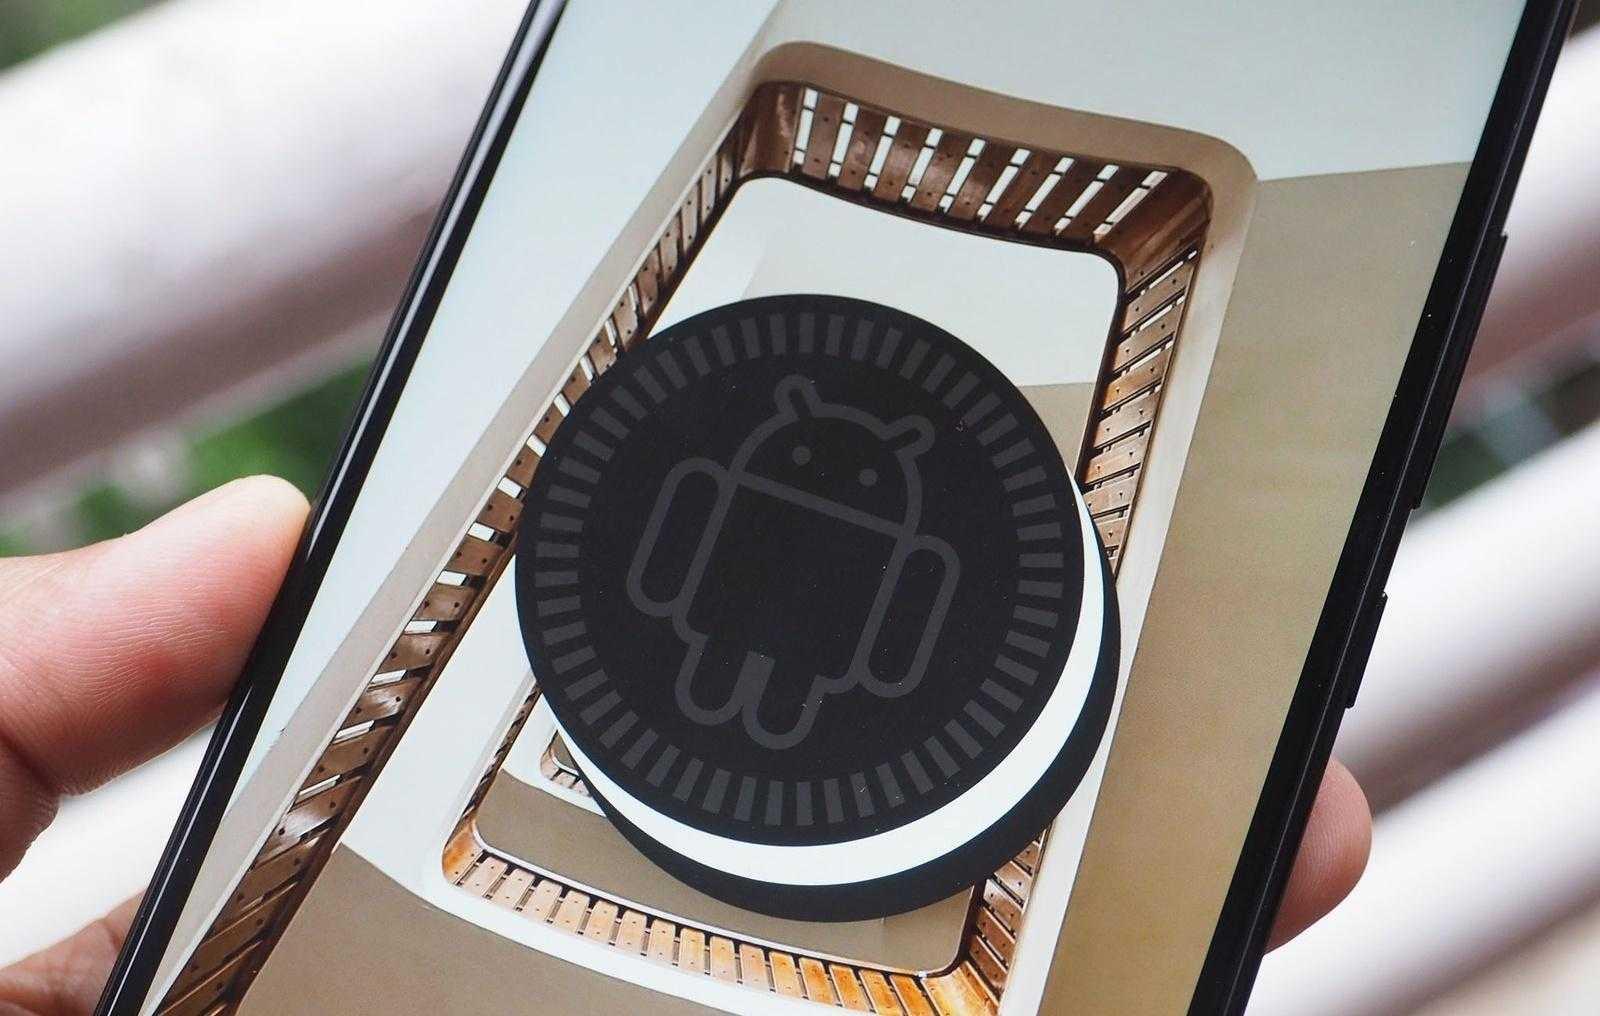 ТОП-5 причин купить Xiaomi Mi A2 (xiaomi mi a2 3 0 e1532515795676)